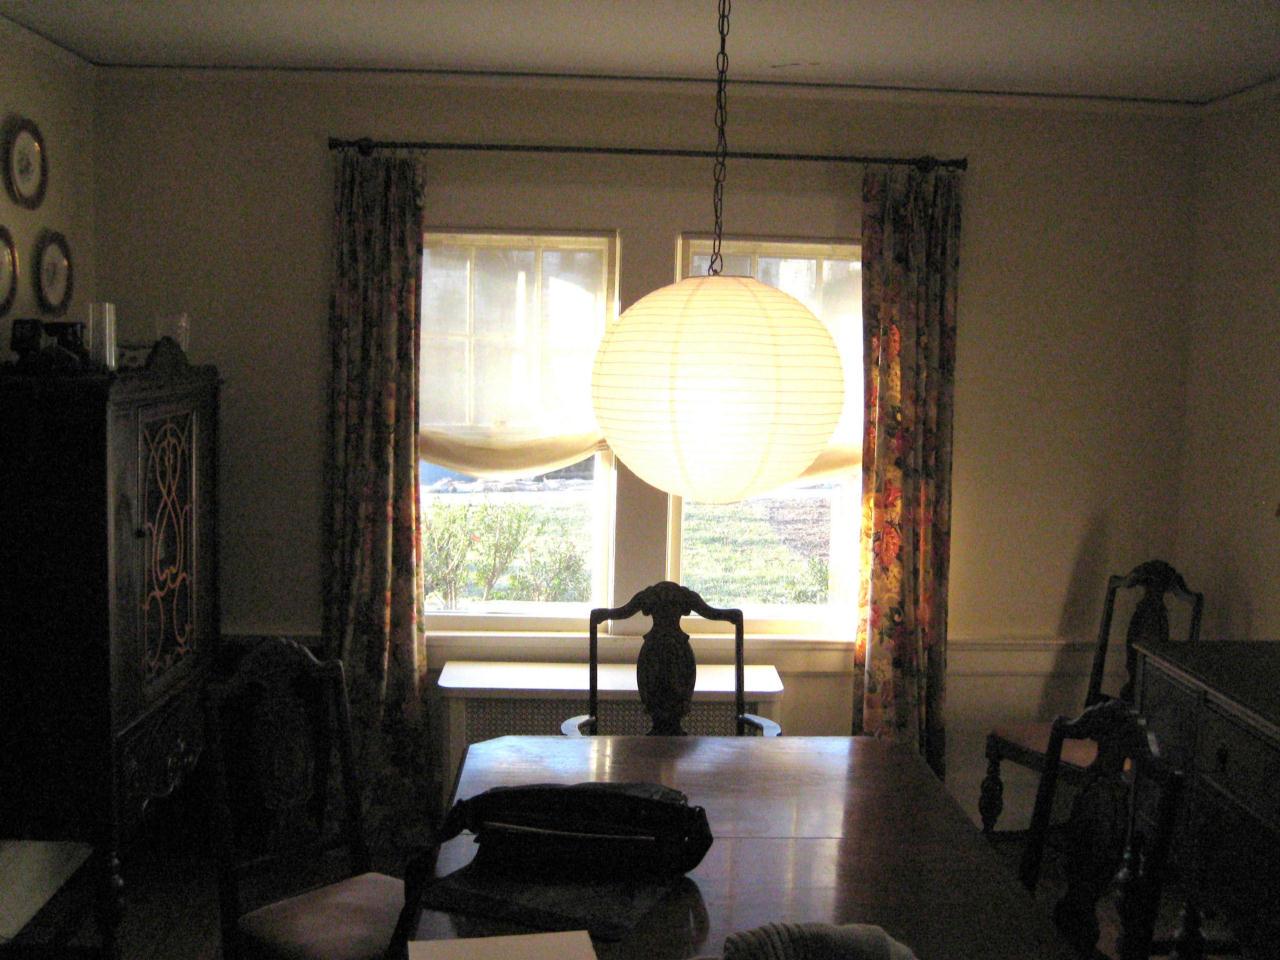 Kitchen dining room renovation john m reimnitz for Dining room renovation